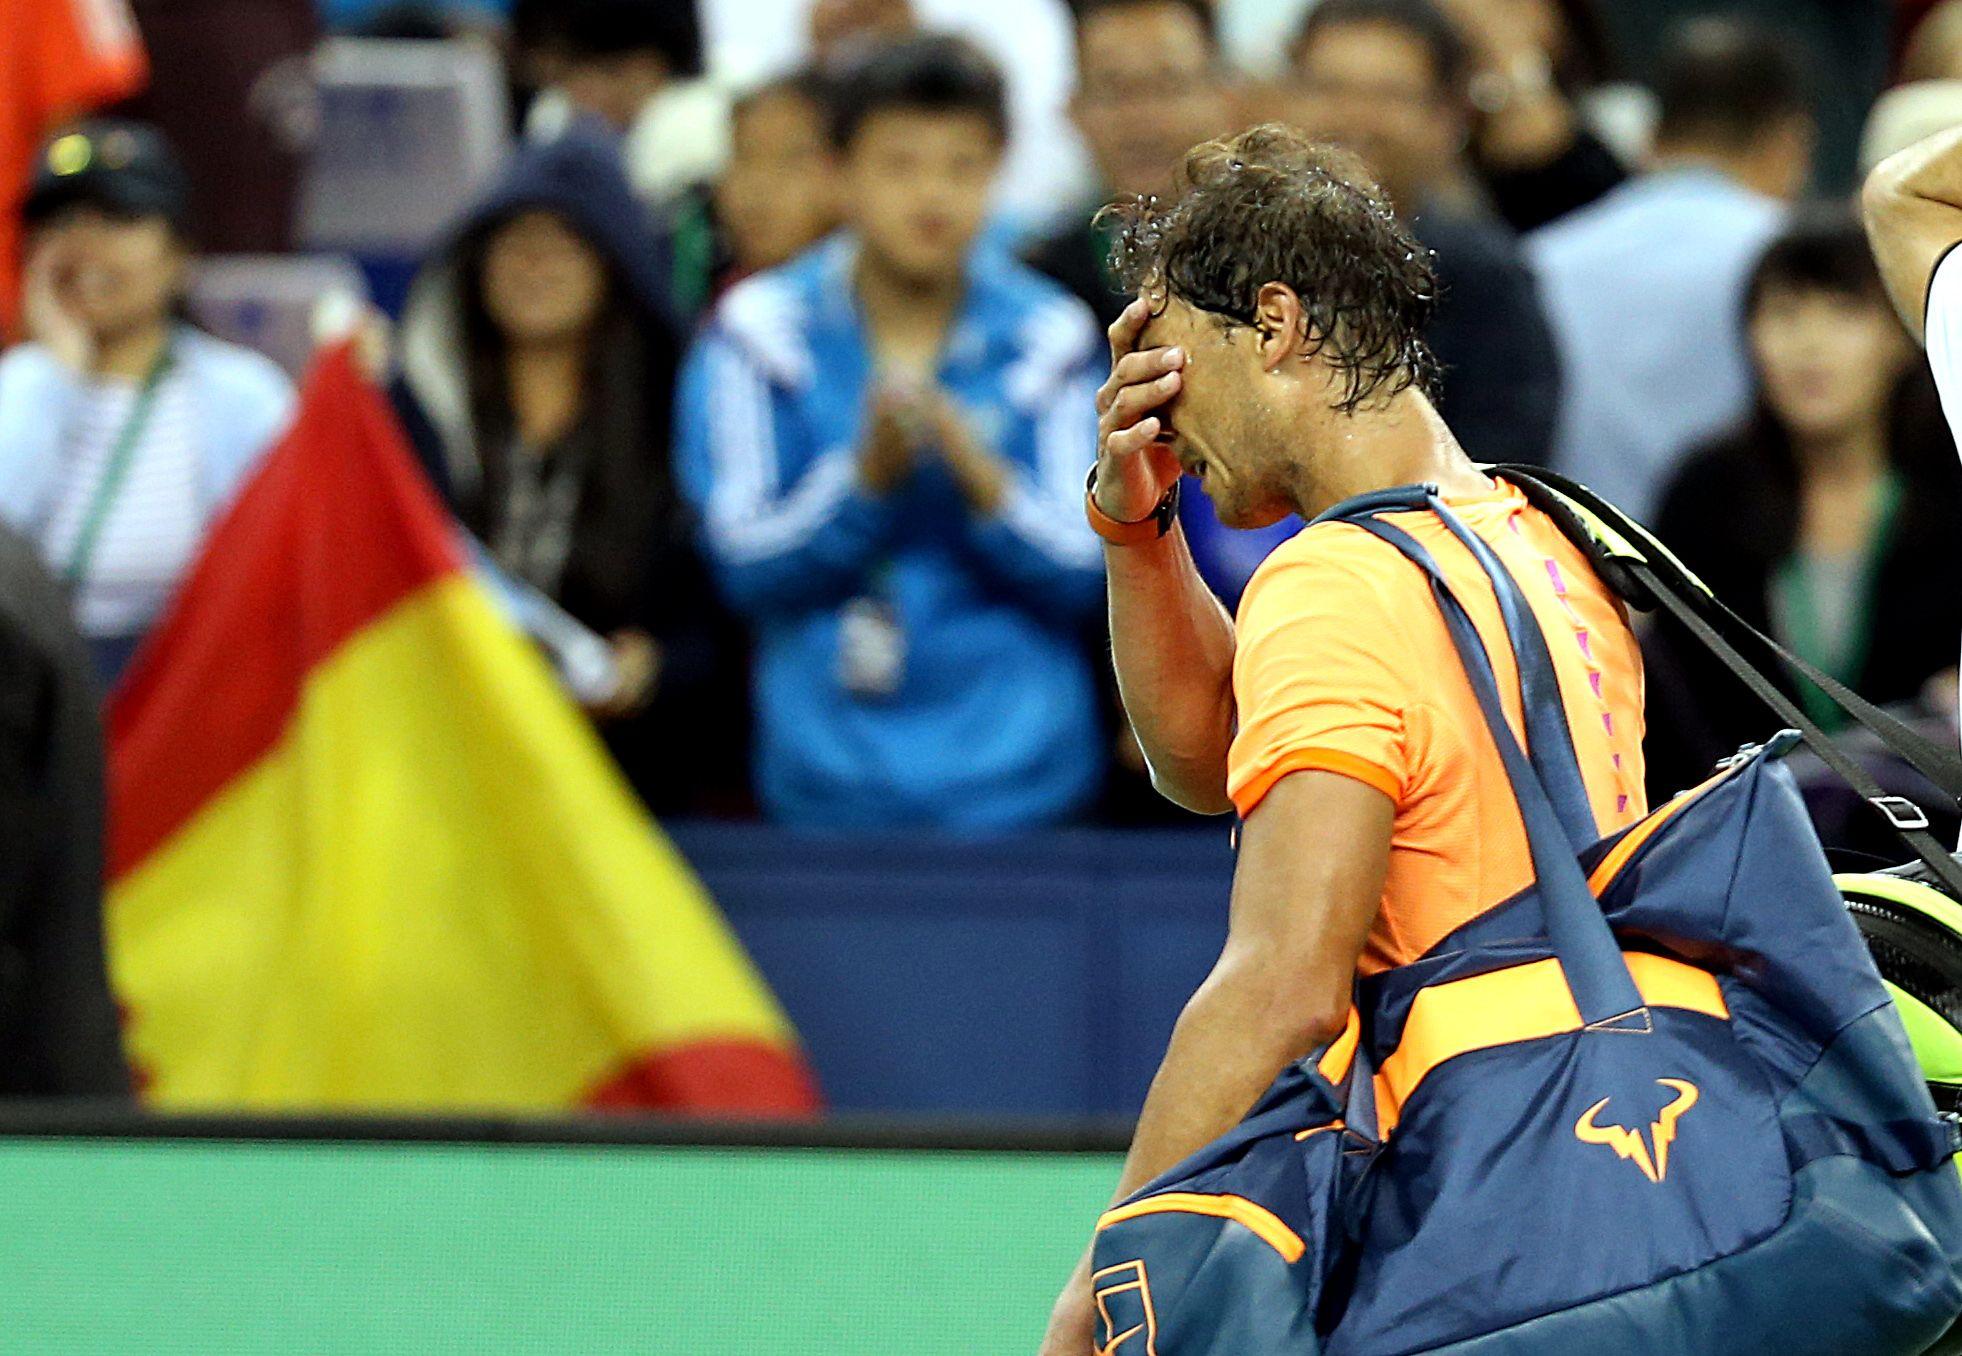 Tennis - ATP - Fin de saison pour Nadal ?